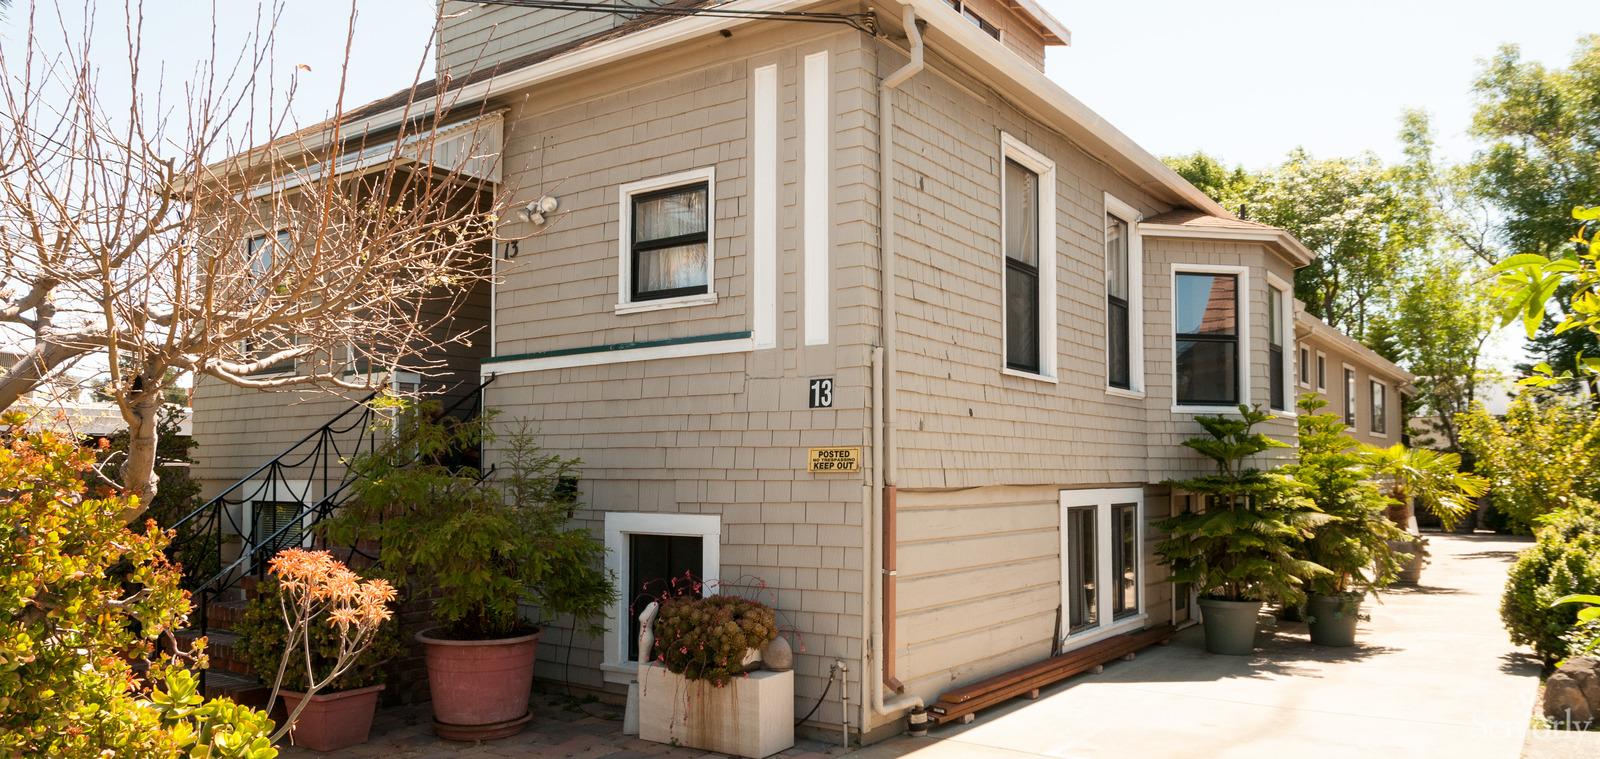 B&B Residential Facilities (13 W) San Mateo CA 2